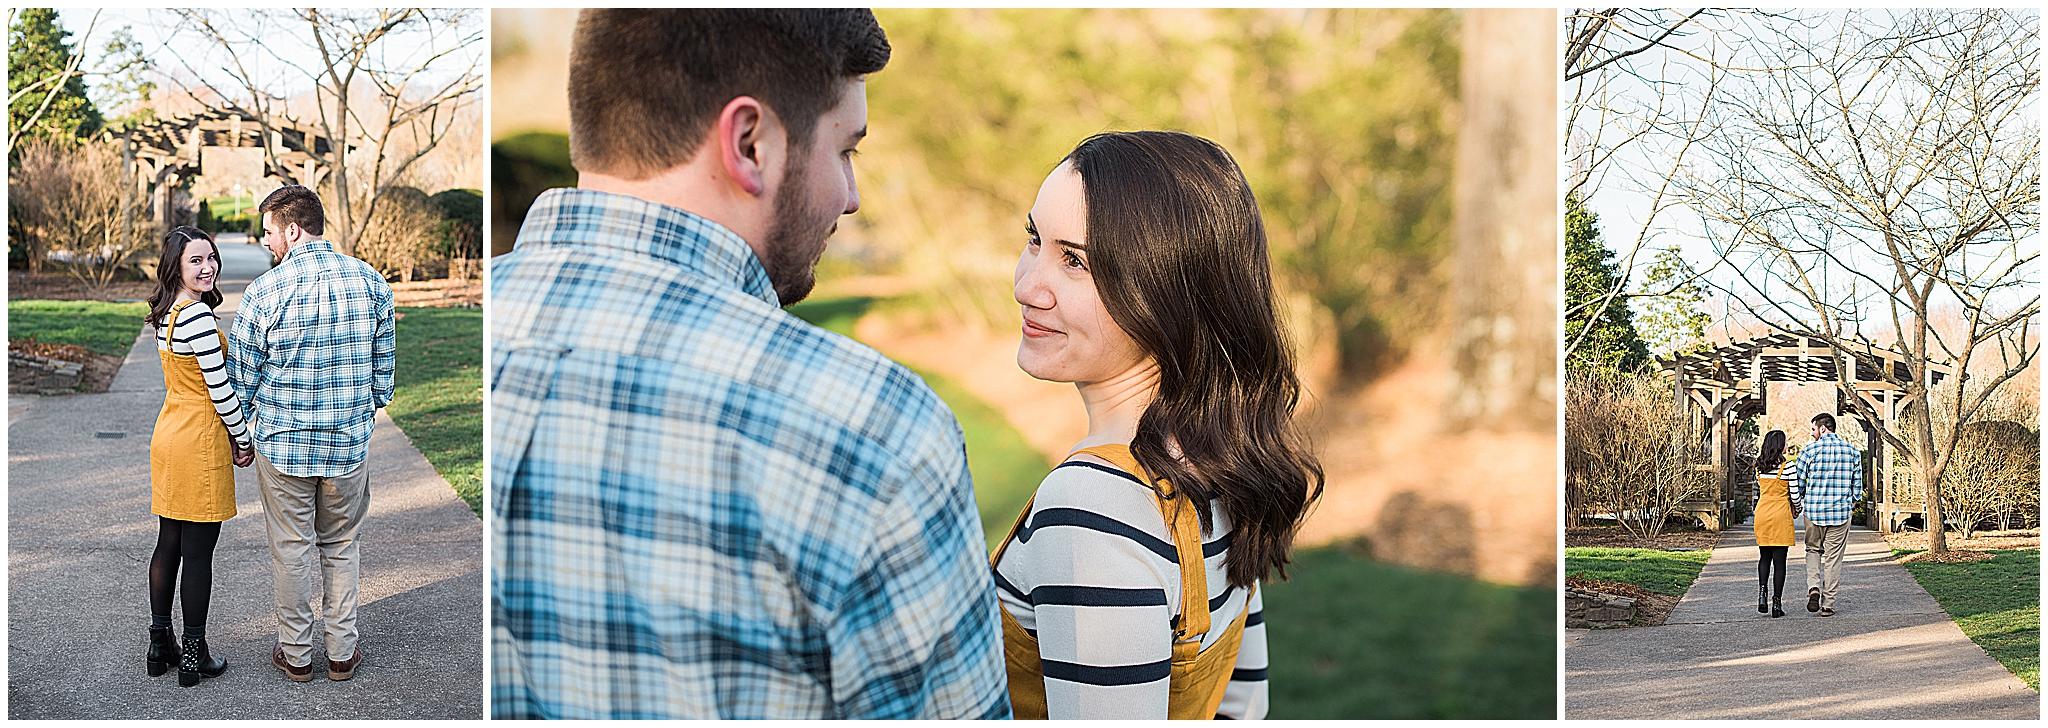 Wedding_Photographer_Asheville_engagement_Arboretum_0004.jpg